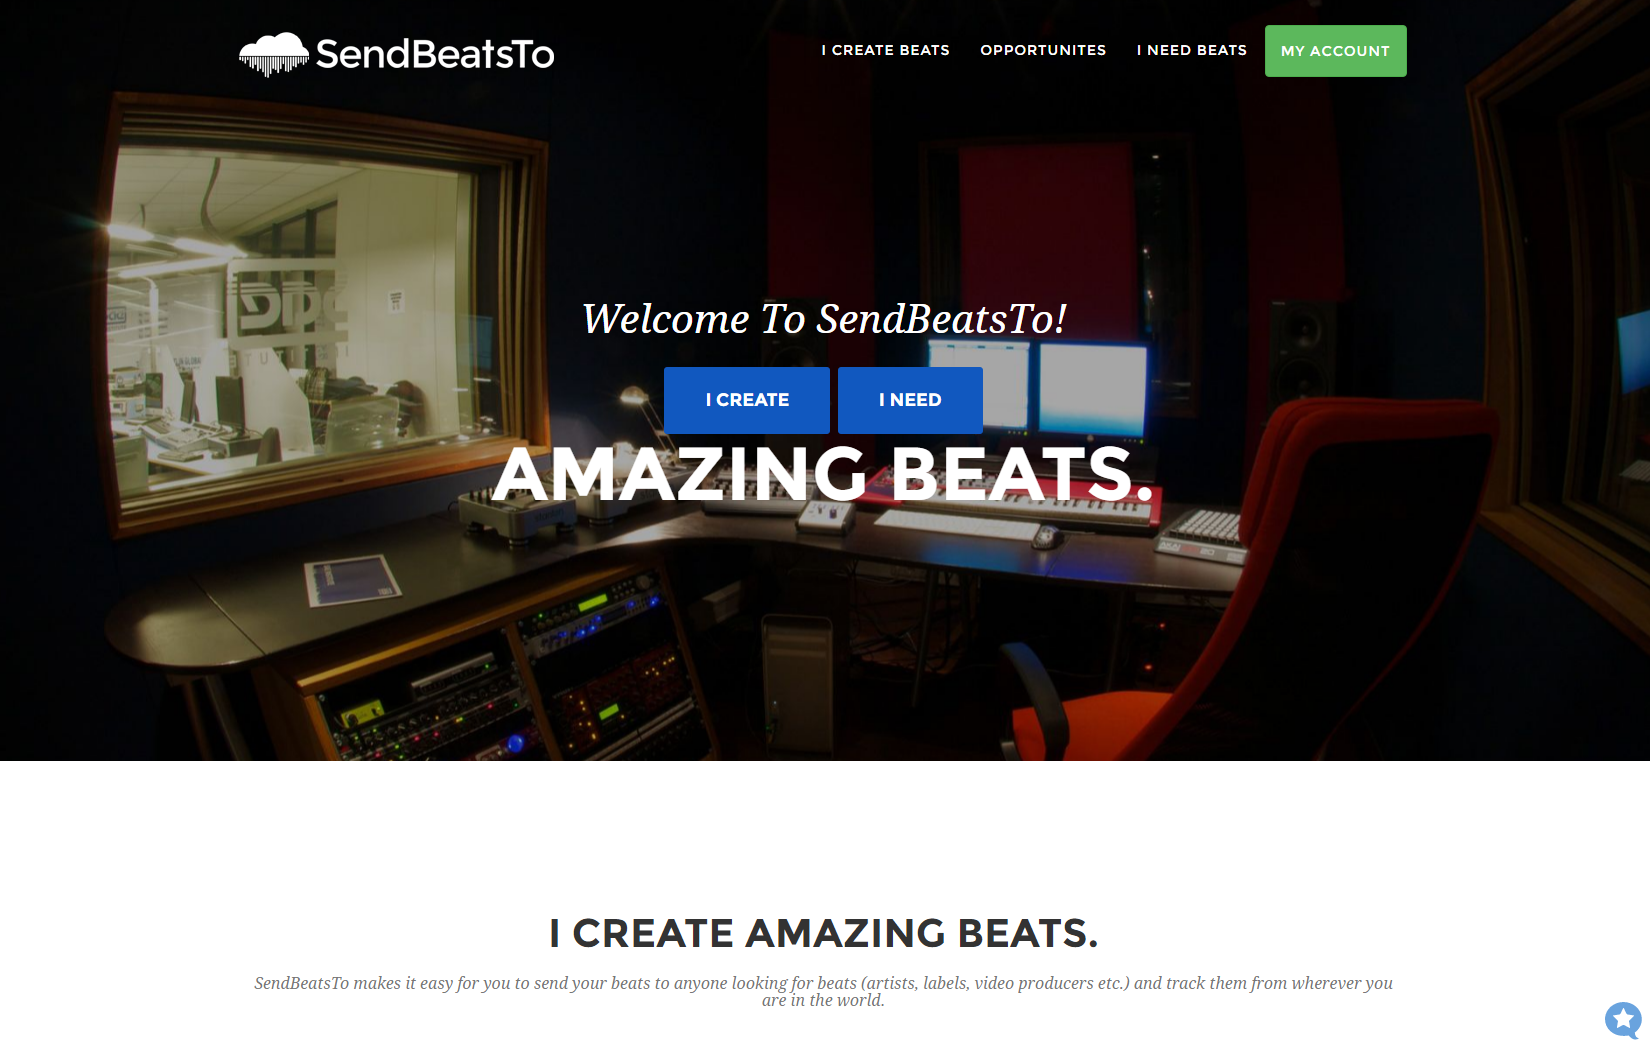 SendBeatsTo homepage (top)